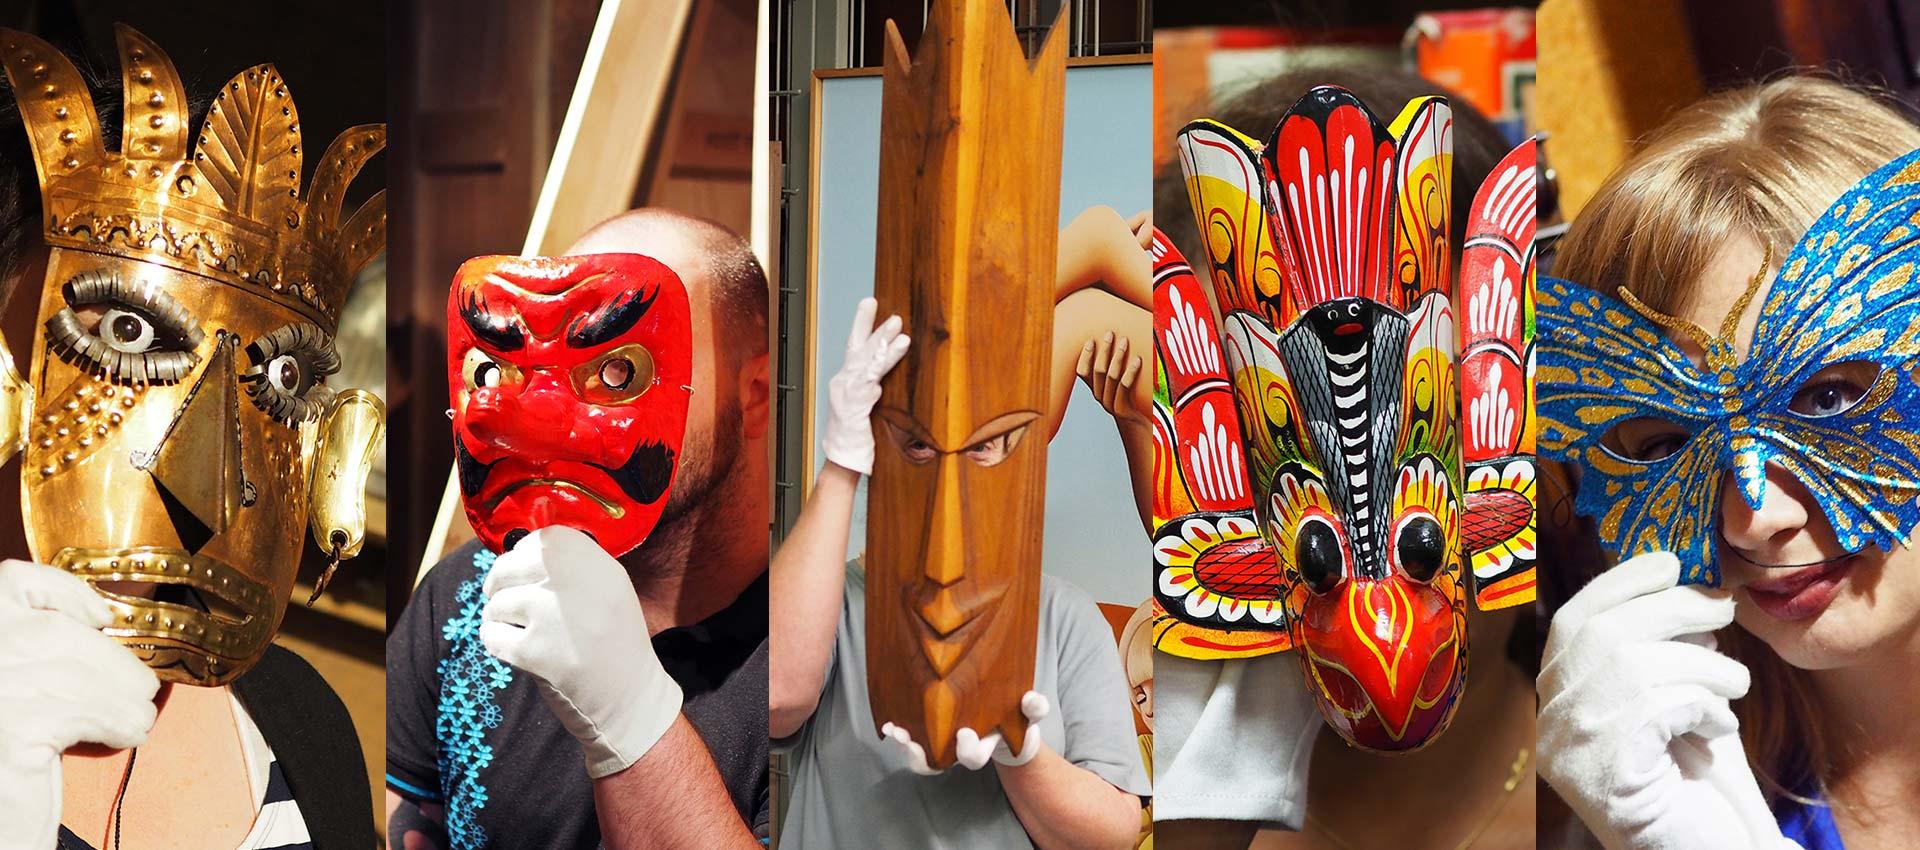 https://www.temanawa.co.nz/wp-content/uploads/2019/03/Festival-of-Cultures-masks-banner.jpg